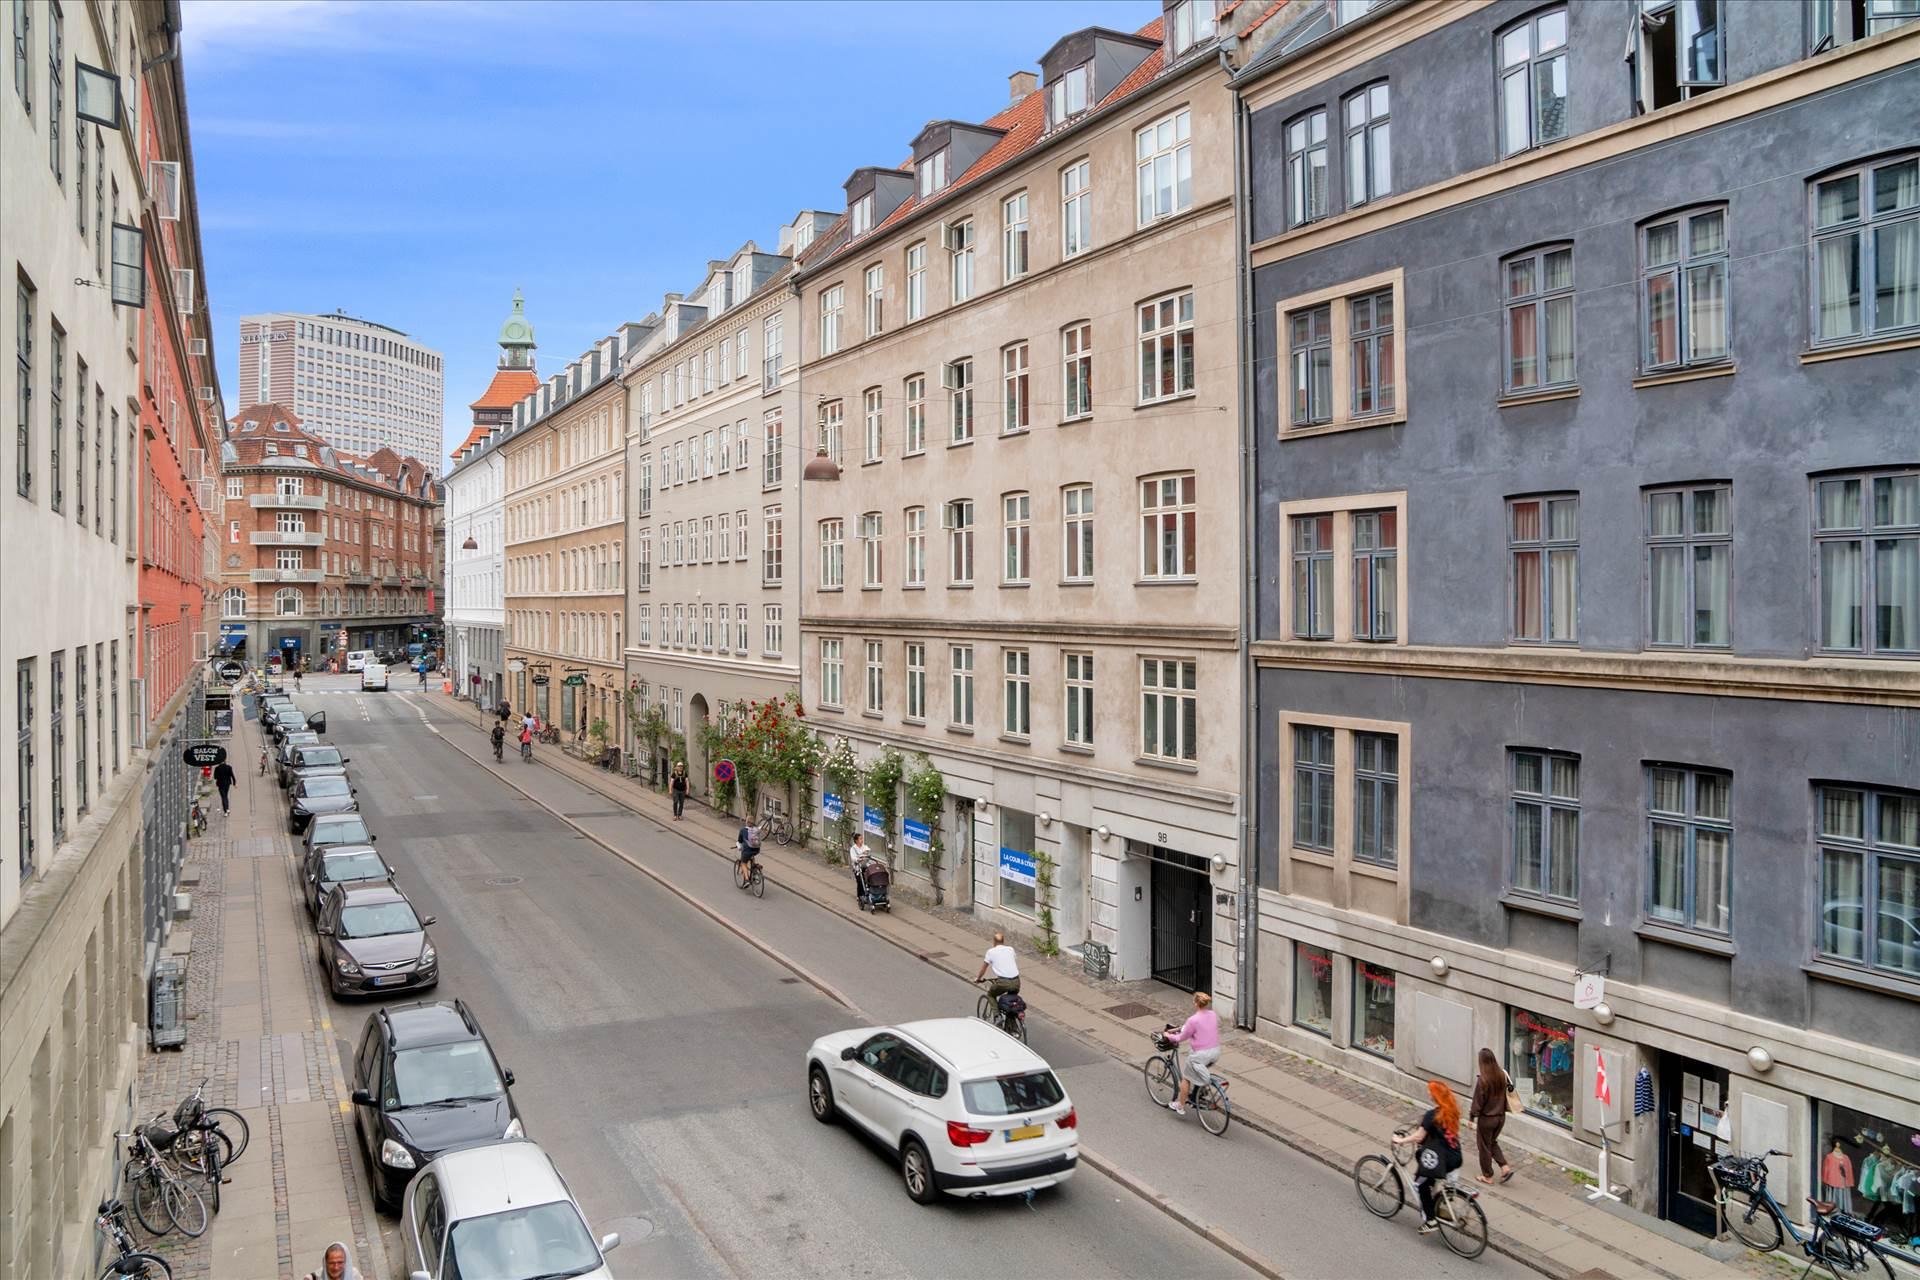 185 m² kontor/klinik/butik • Vesterbro